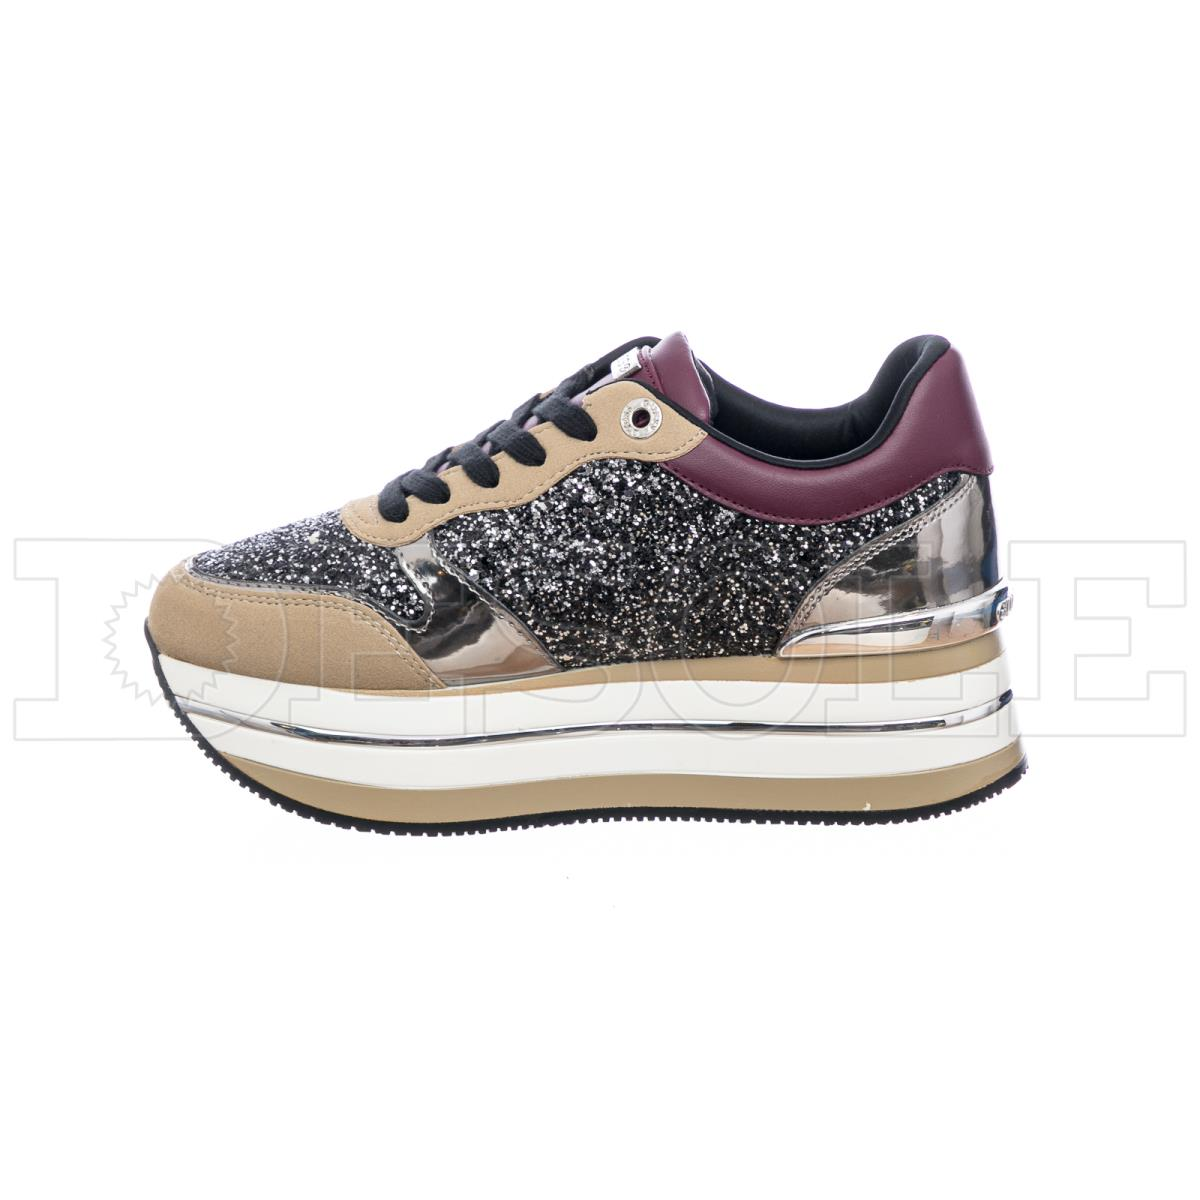 Sneakers donna platform|GUESS FL7HN4FAM12 glitter bordeaux